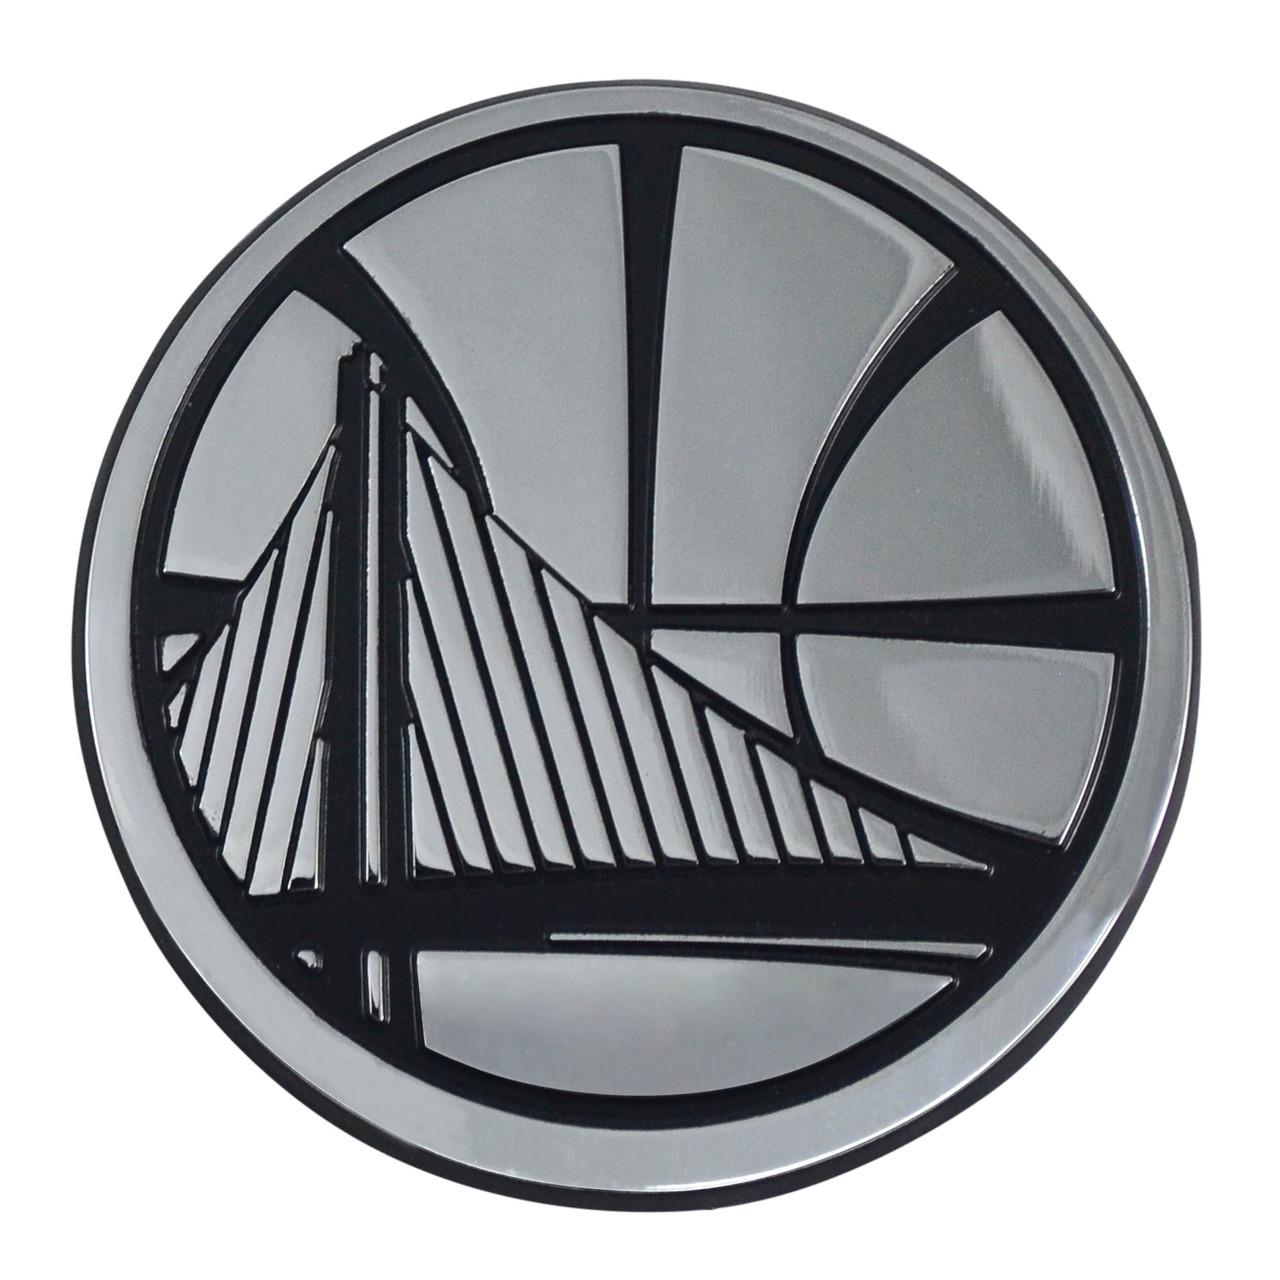 Golden State Warriors Auto Emblem Premium Metal Chrome Special Order